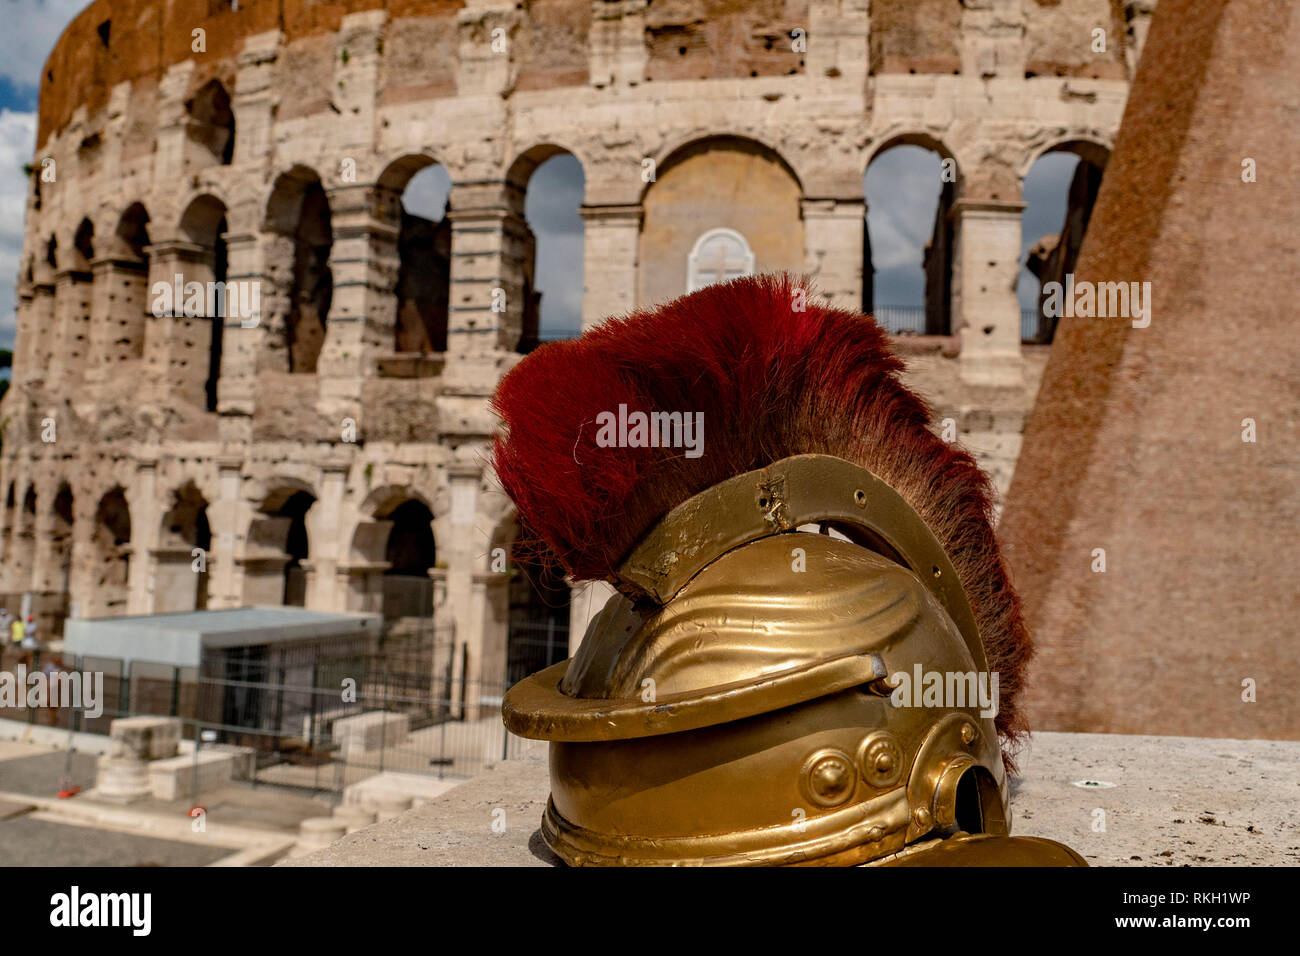 Gladiator Helmet Stock Photos Amp Gladiator Helmet Stock